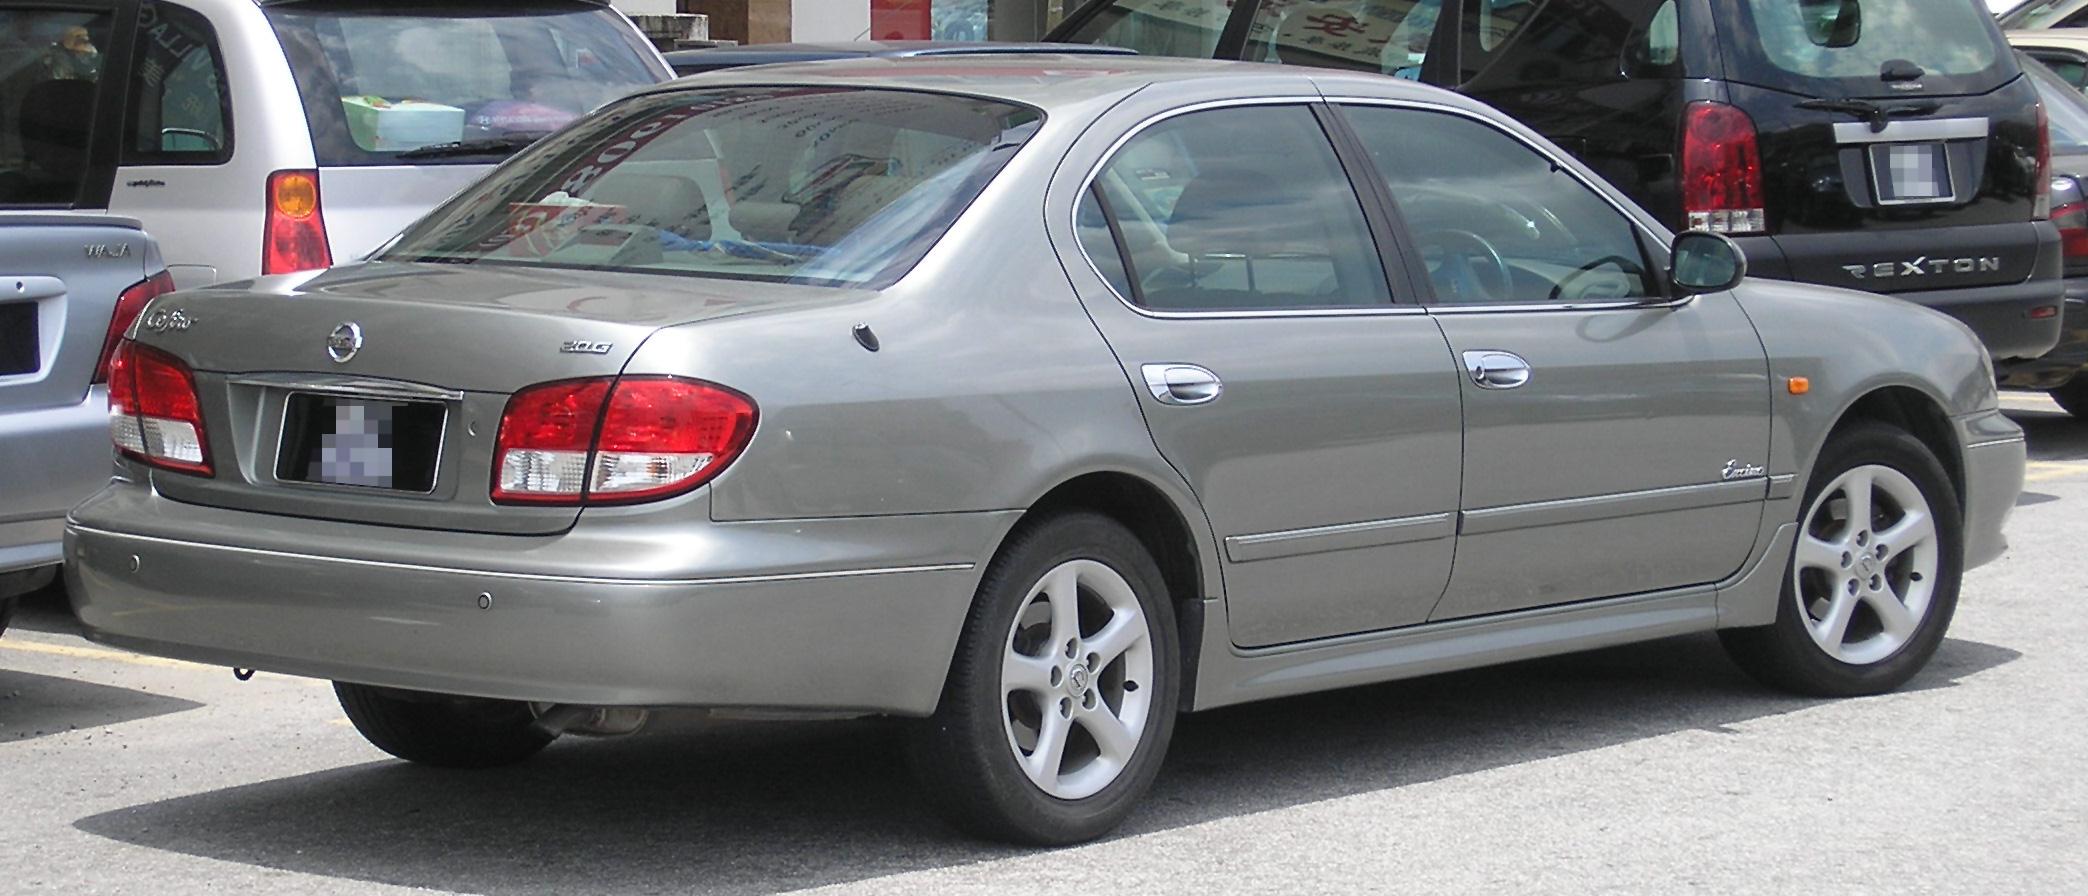 File Nissan Cefiro Third Generation Rear Serdang Jpg